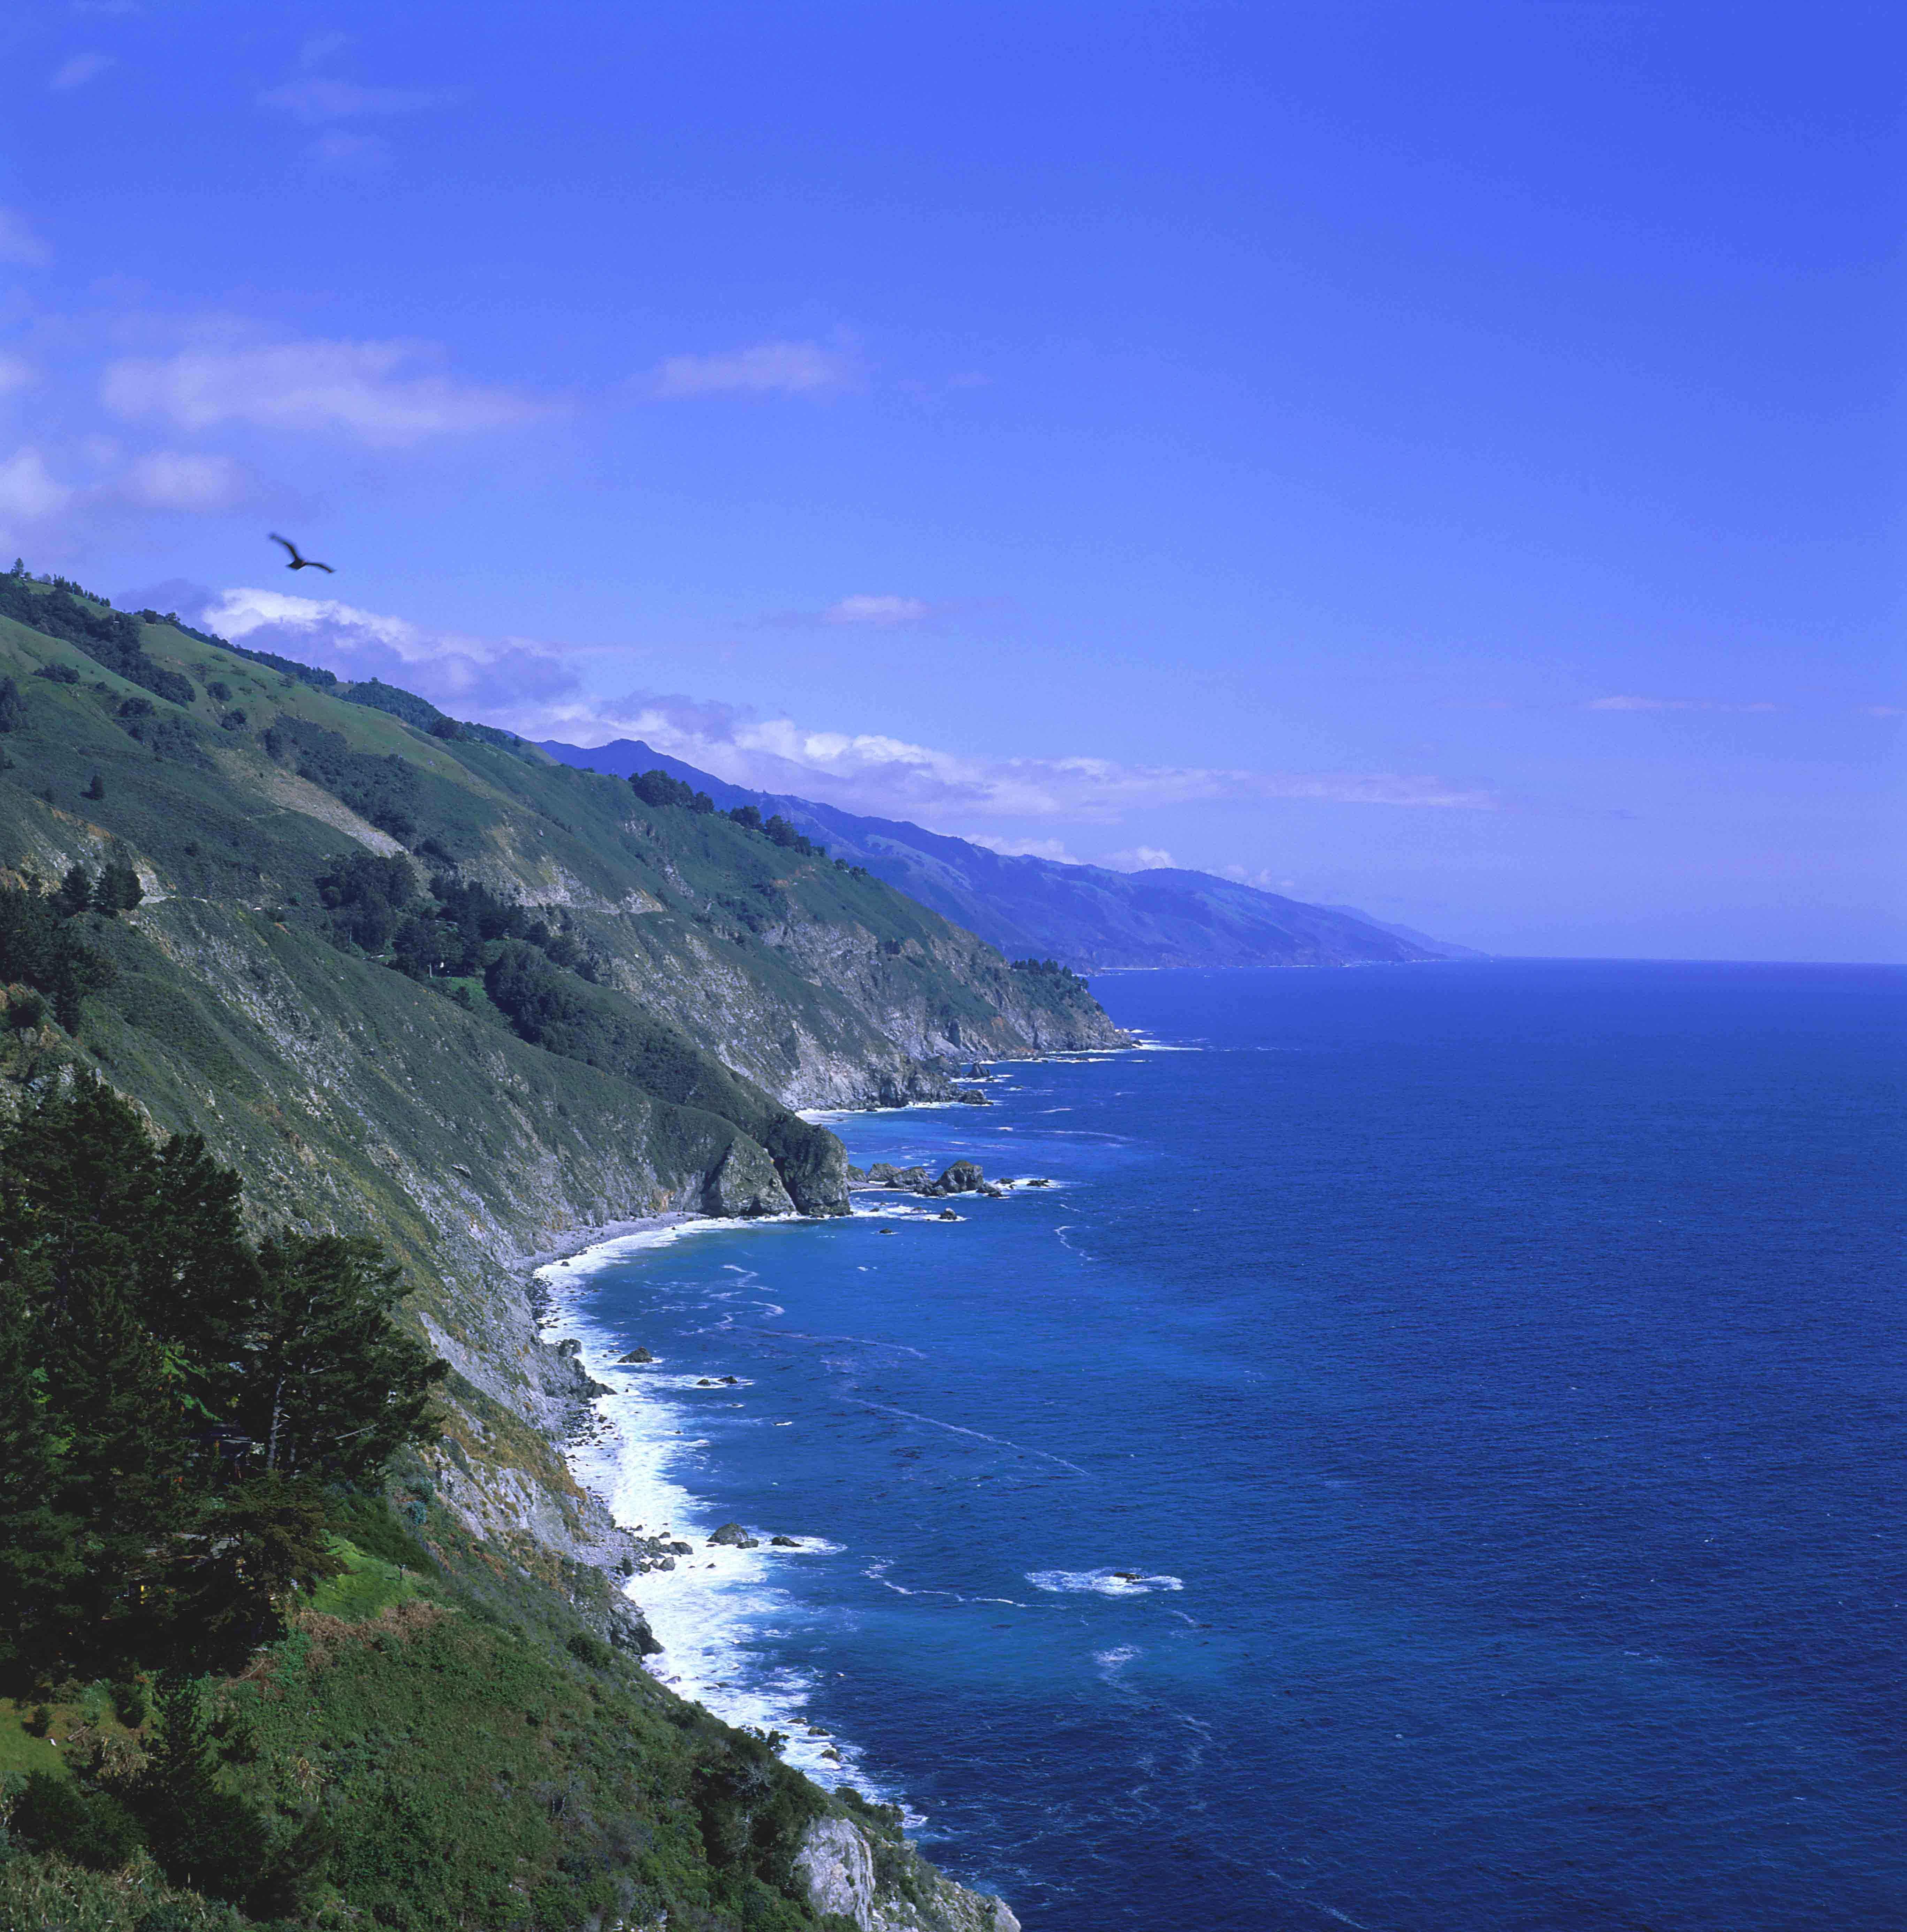 https://0201.nccdn.net/1_2/000/000/194/0c8/Coast3.Big.Sur-5471x5544.jpg